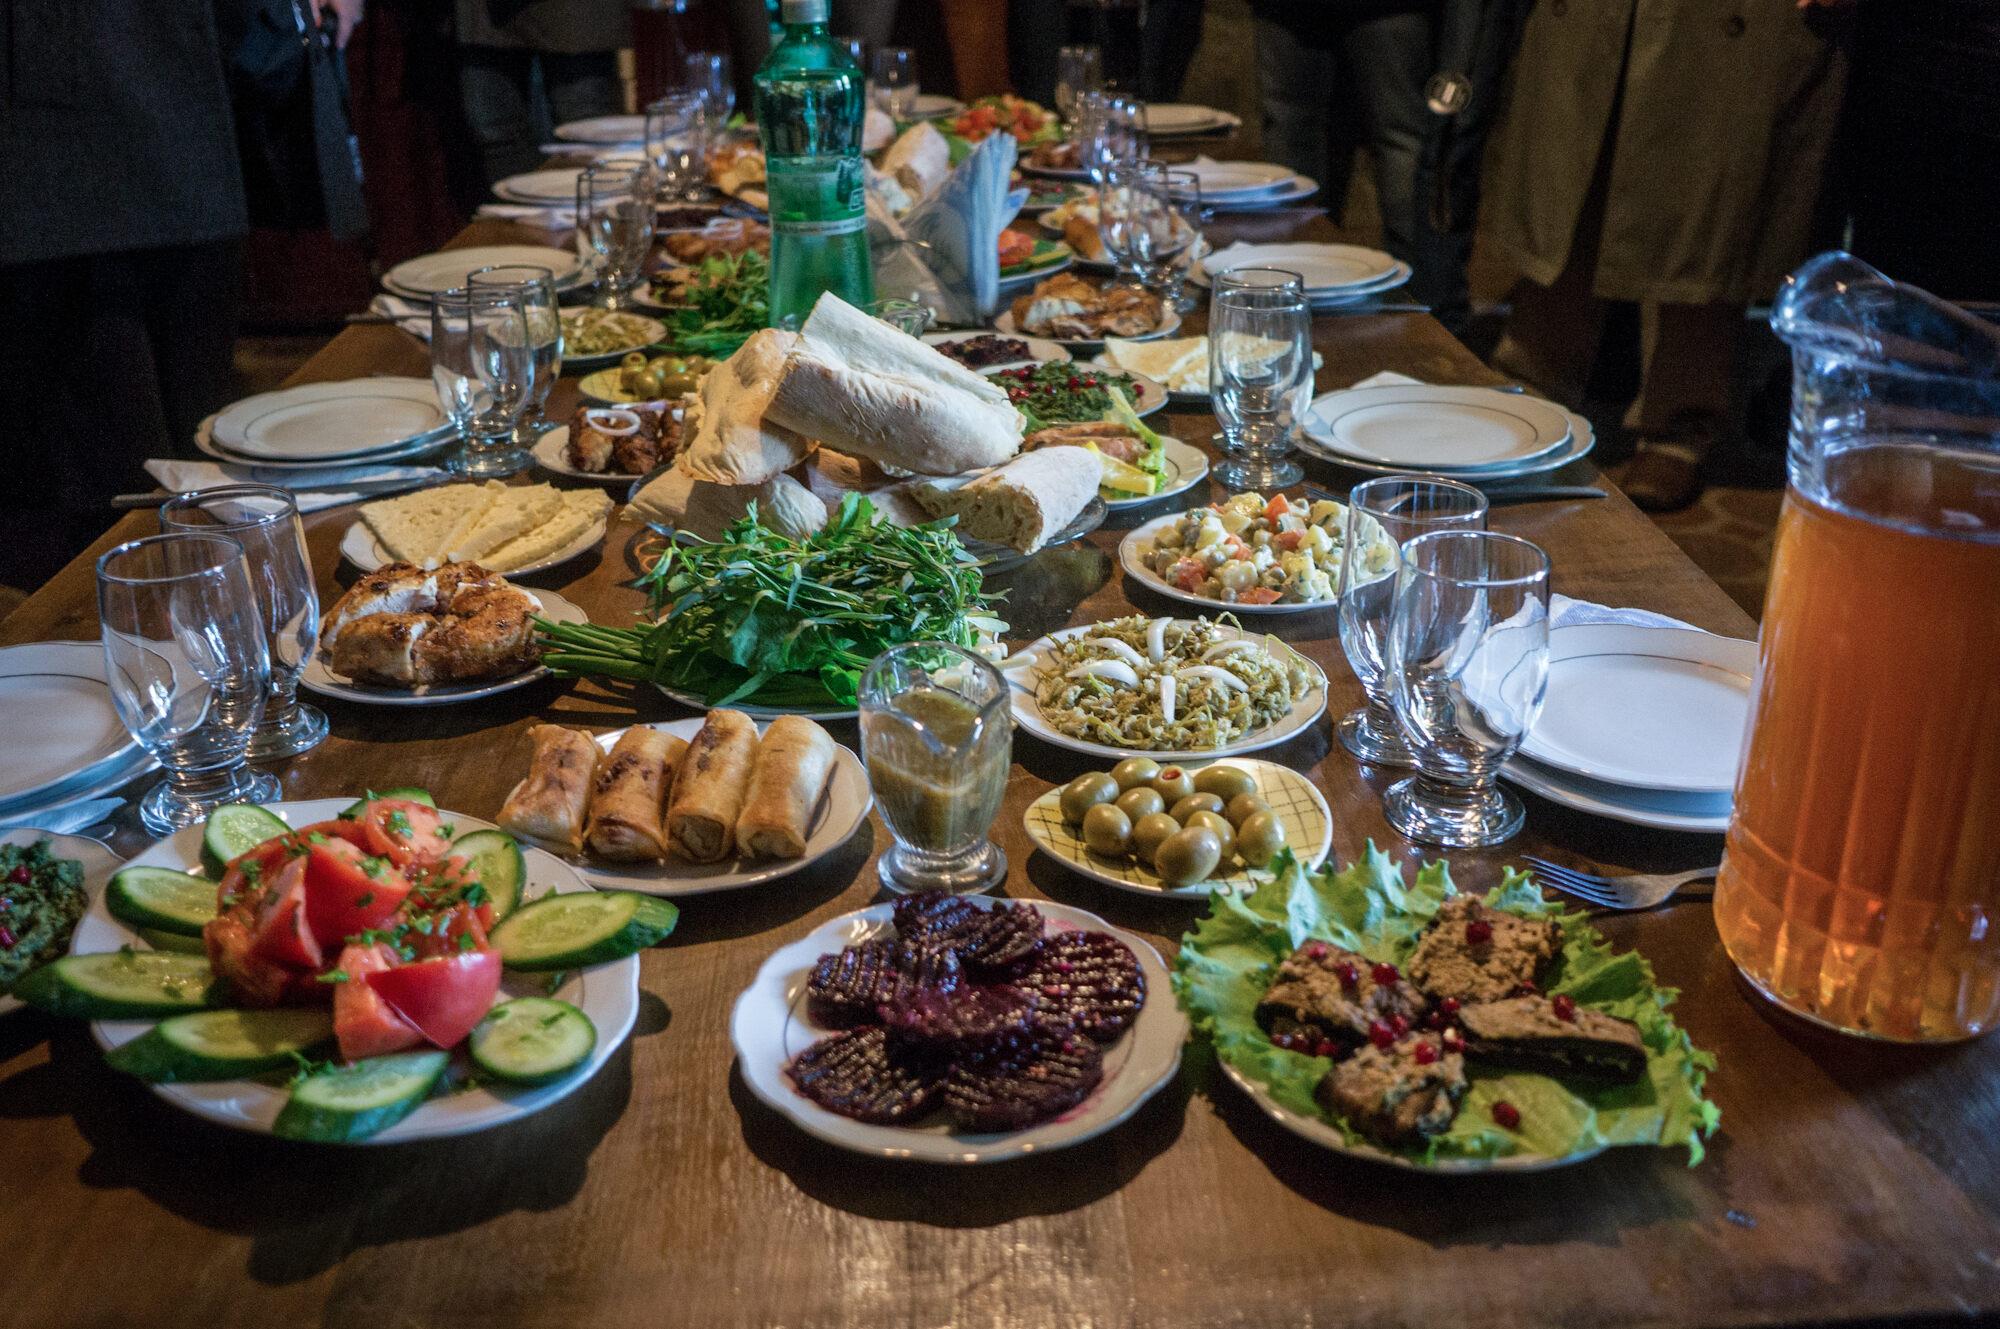 Vladikavkaz, grapes restaurant: oriental cuisine and warm atmosphere 42